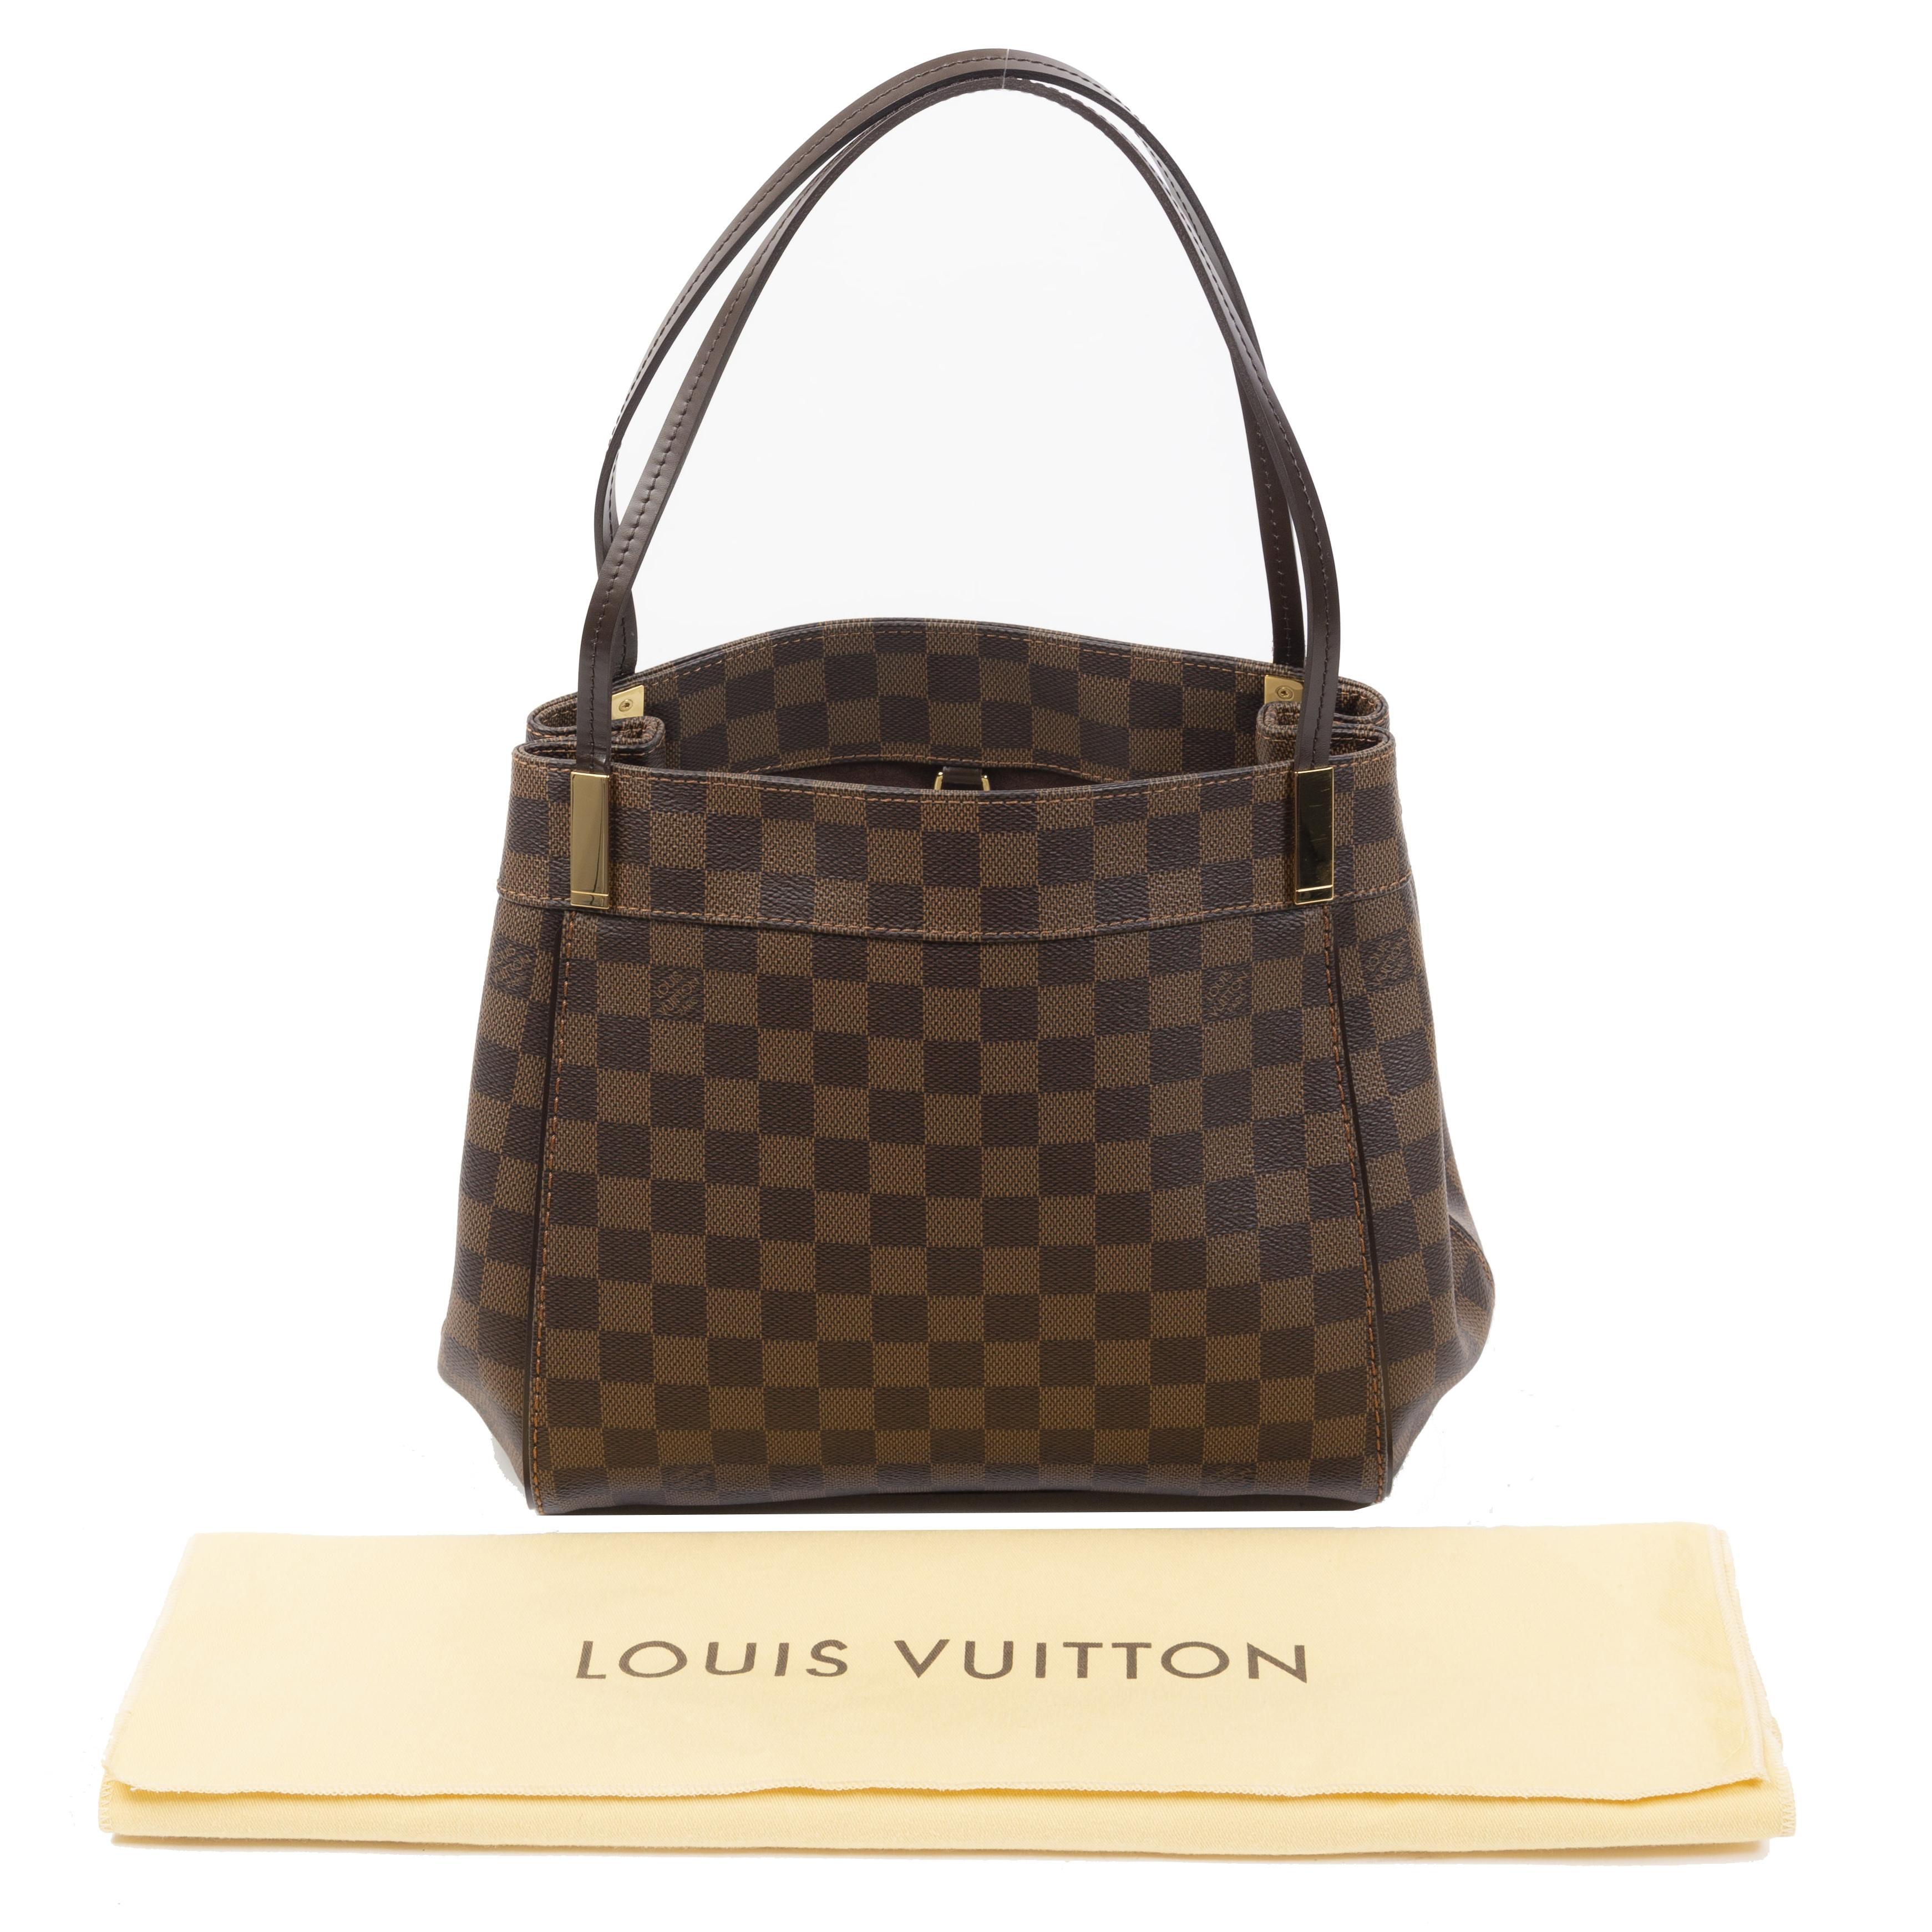 Louis Vuitton Damier Ebene Marlebone Bag